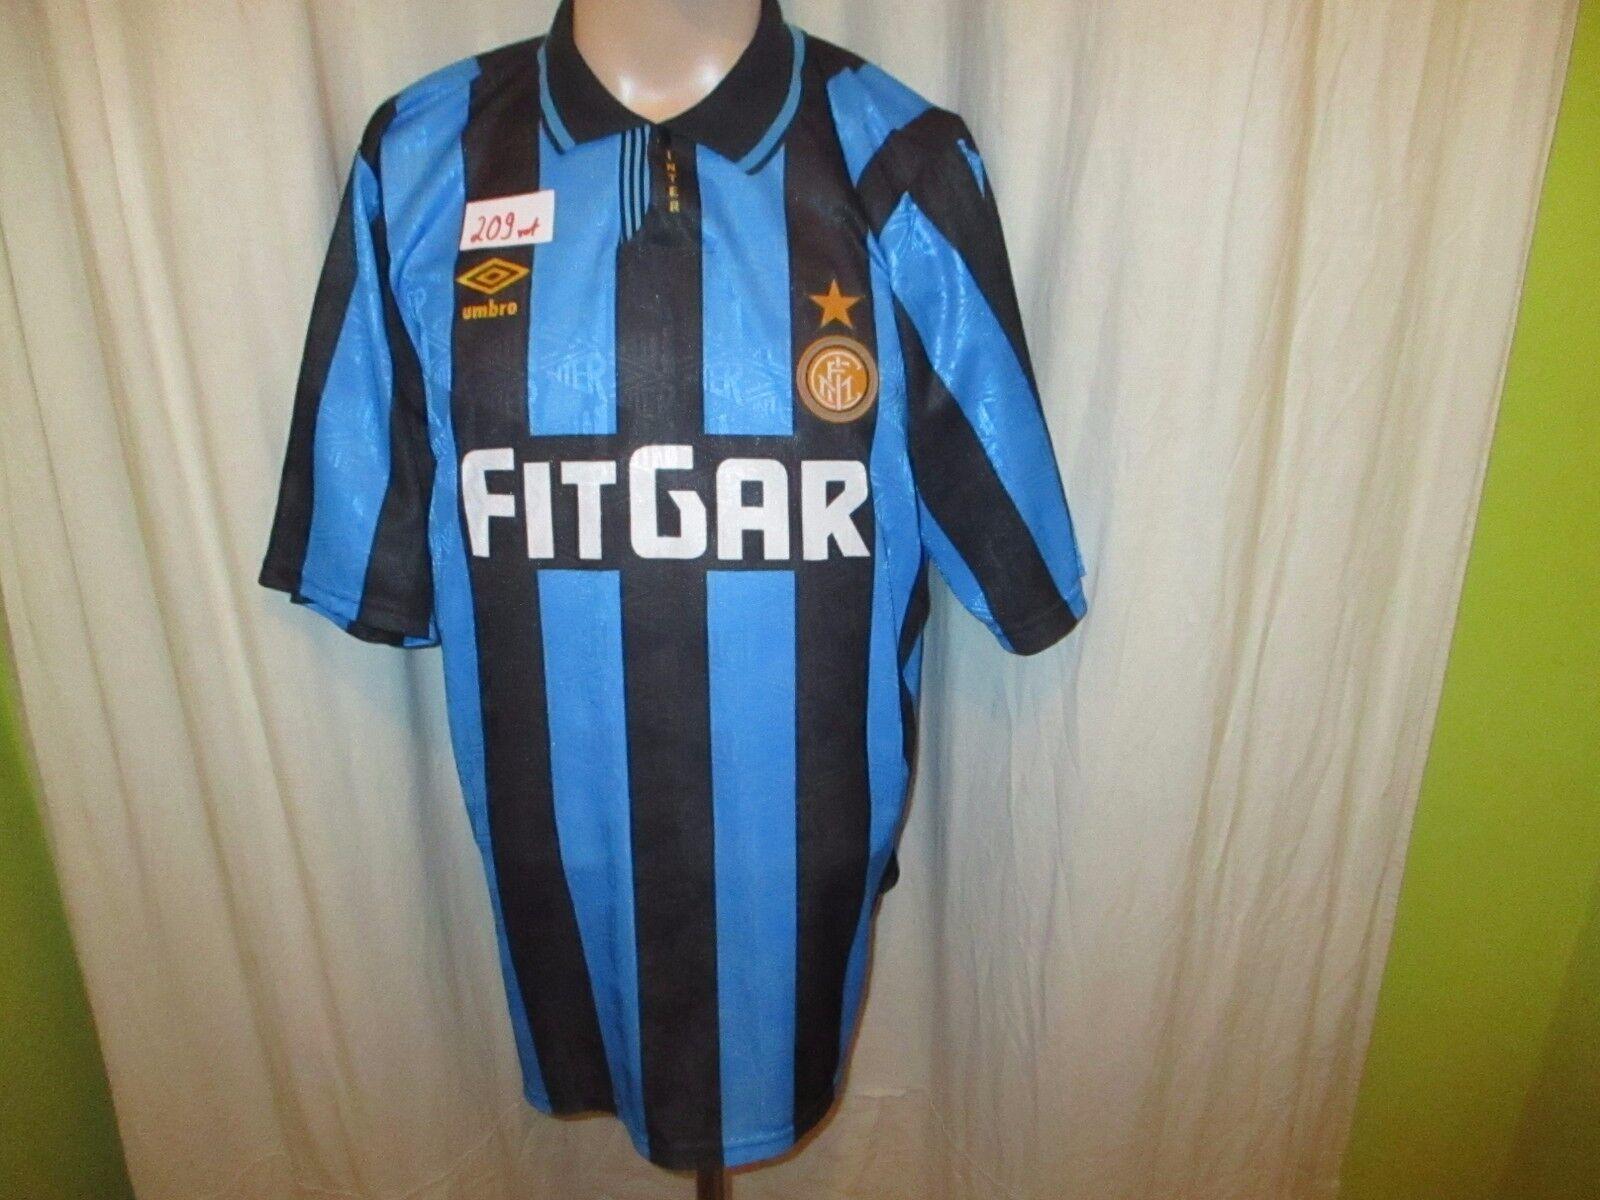 Inter Mailand Original Umbro Heim Trikot 1991 92  FITGAR  + Nr.11 Gr.XL    Shopping Online